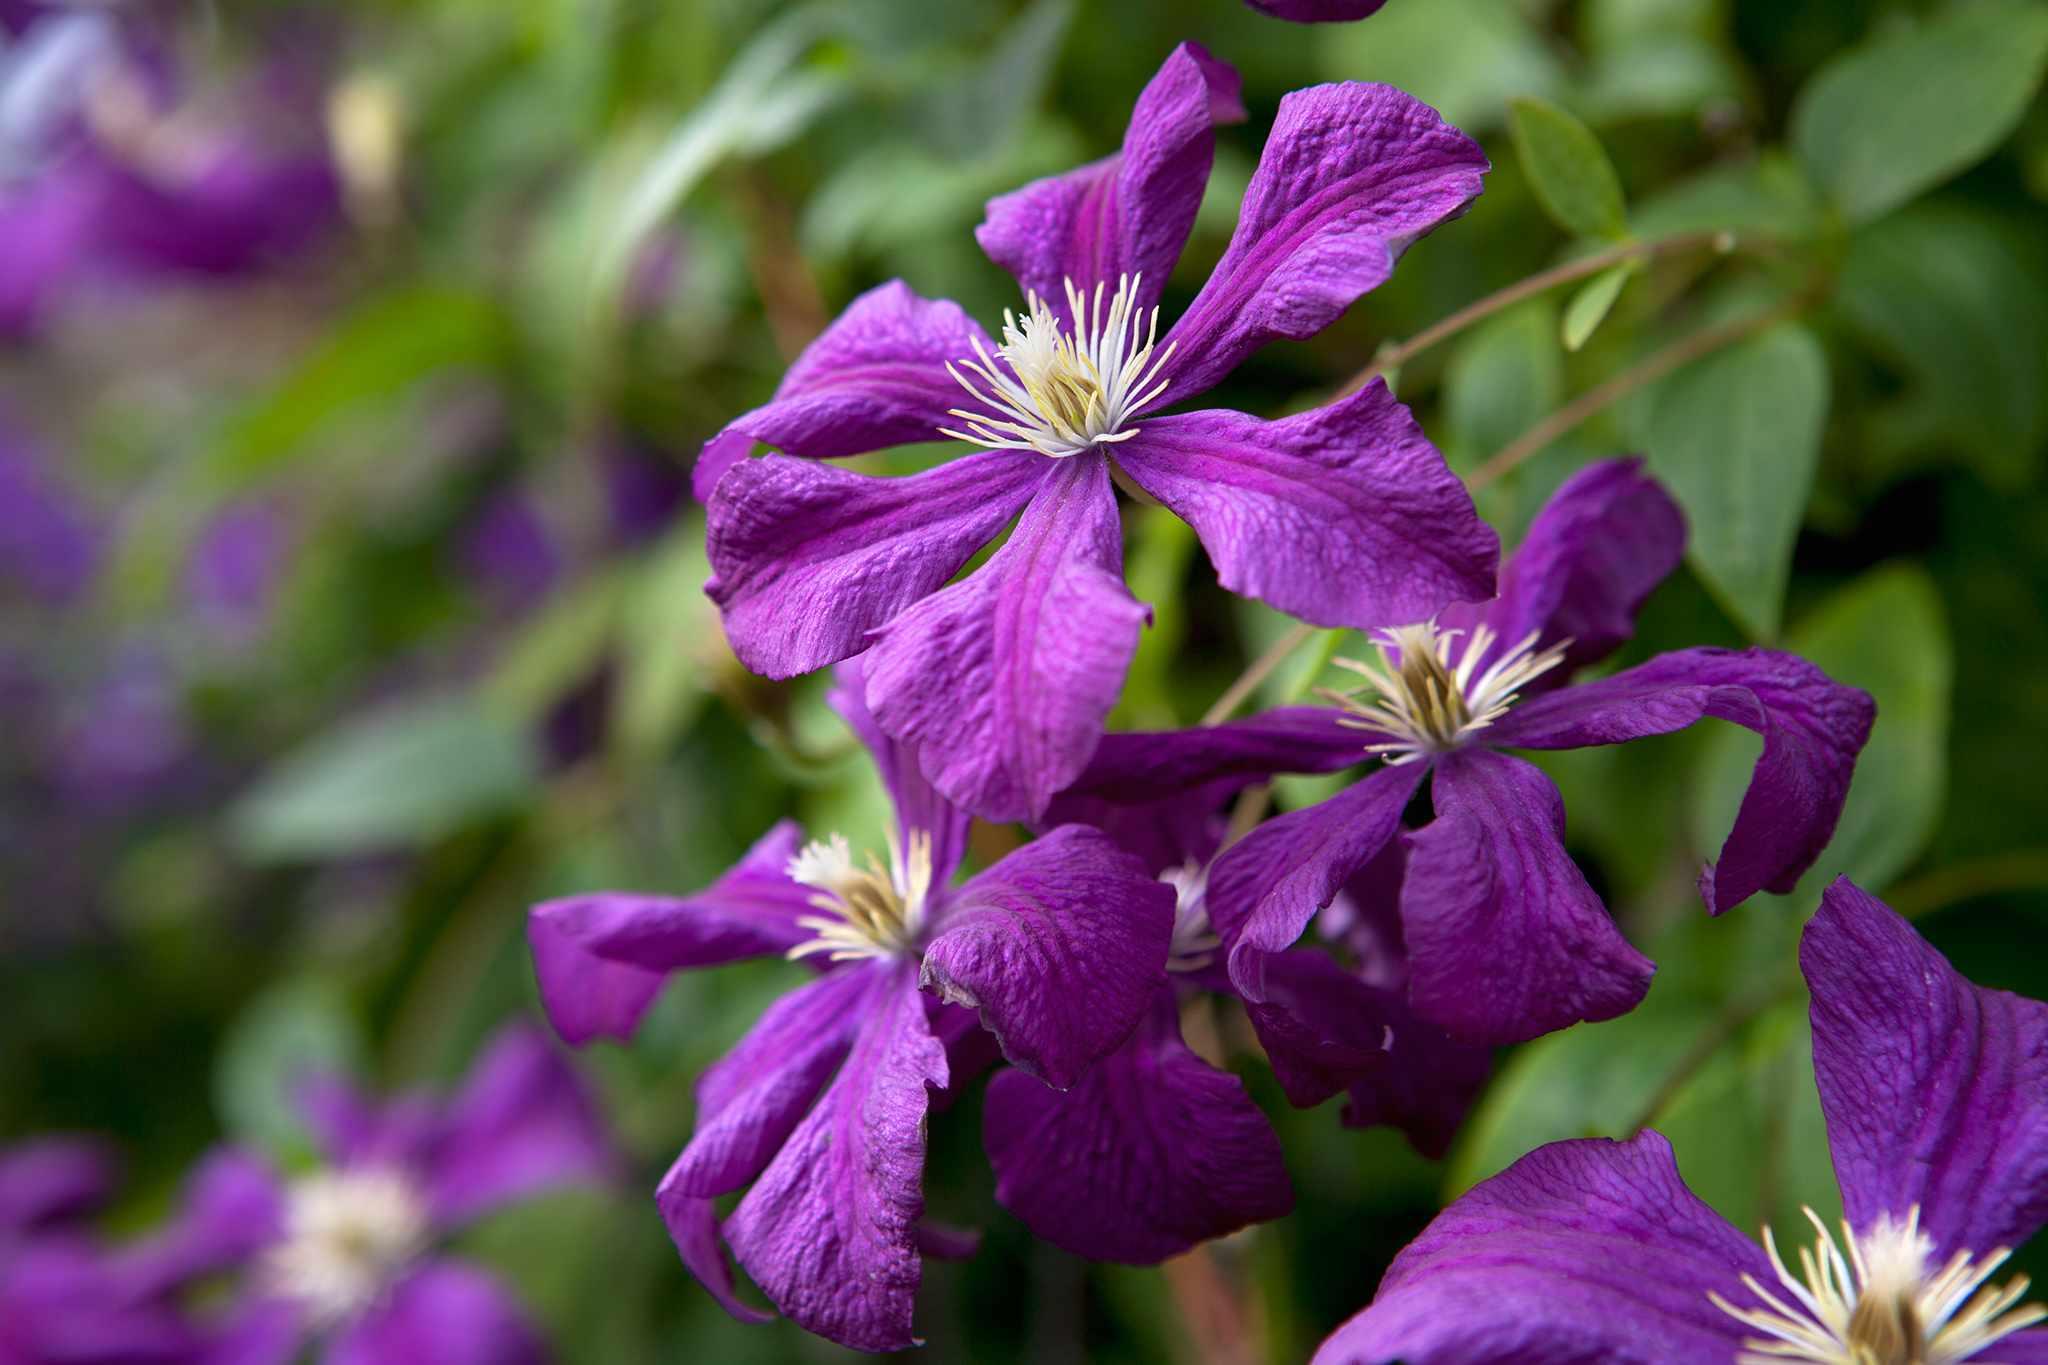 Clematis viticella Etoile Violette